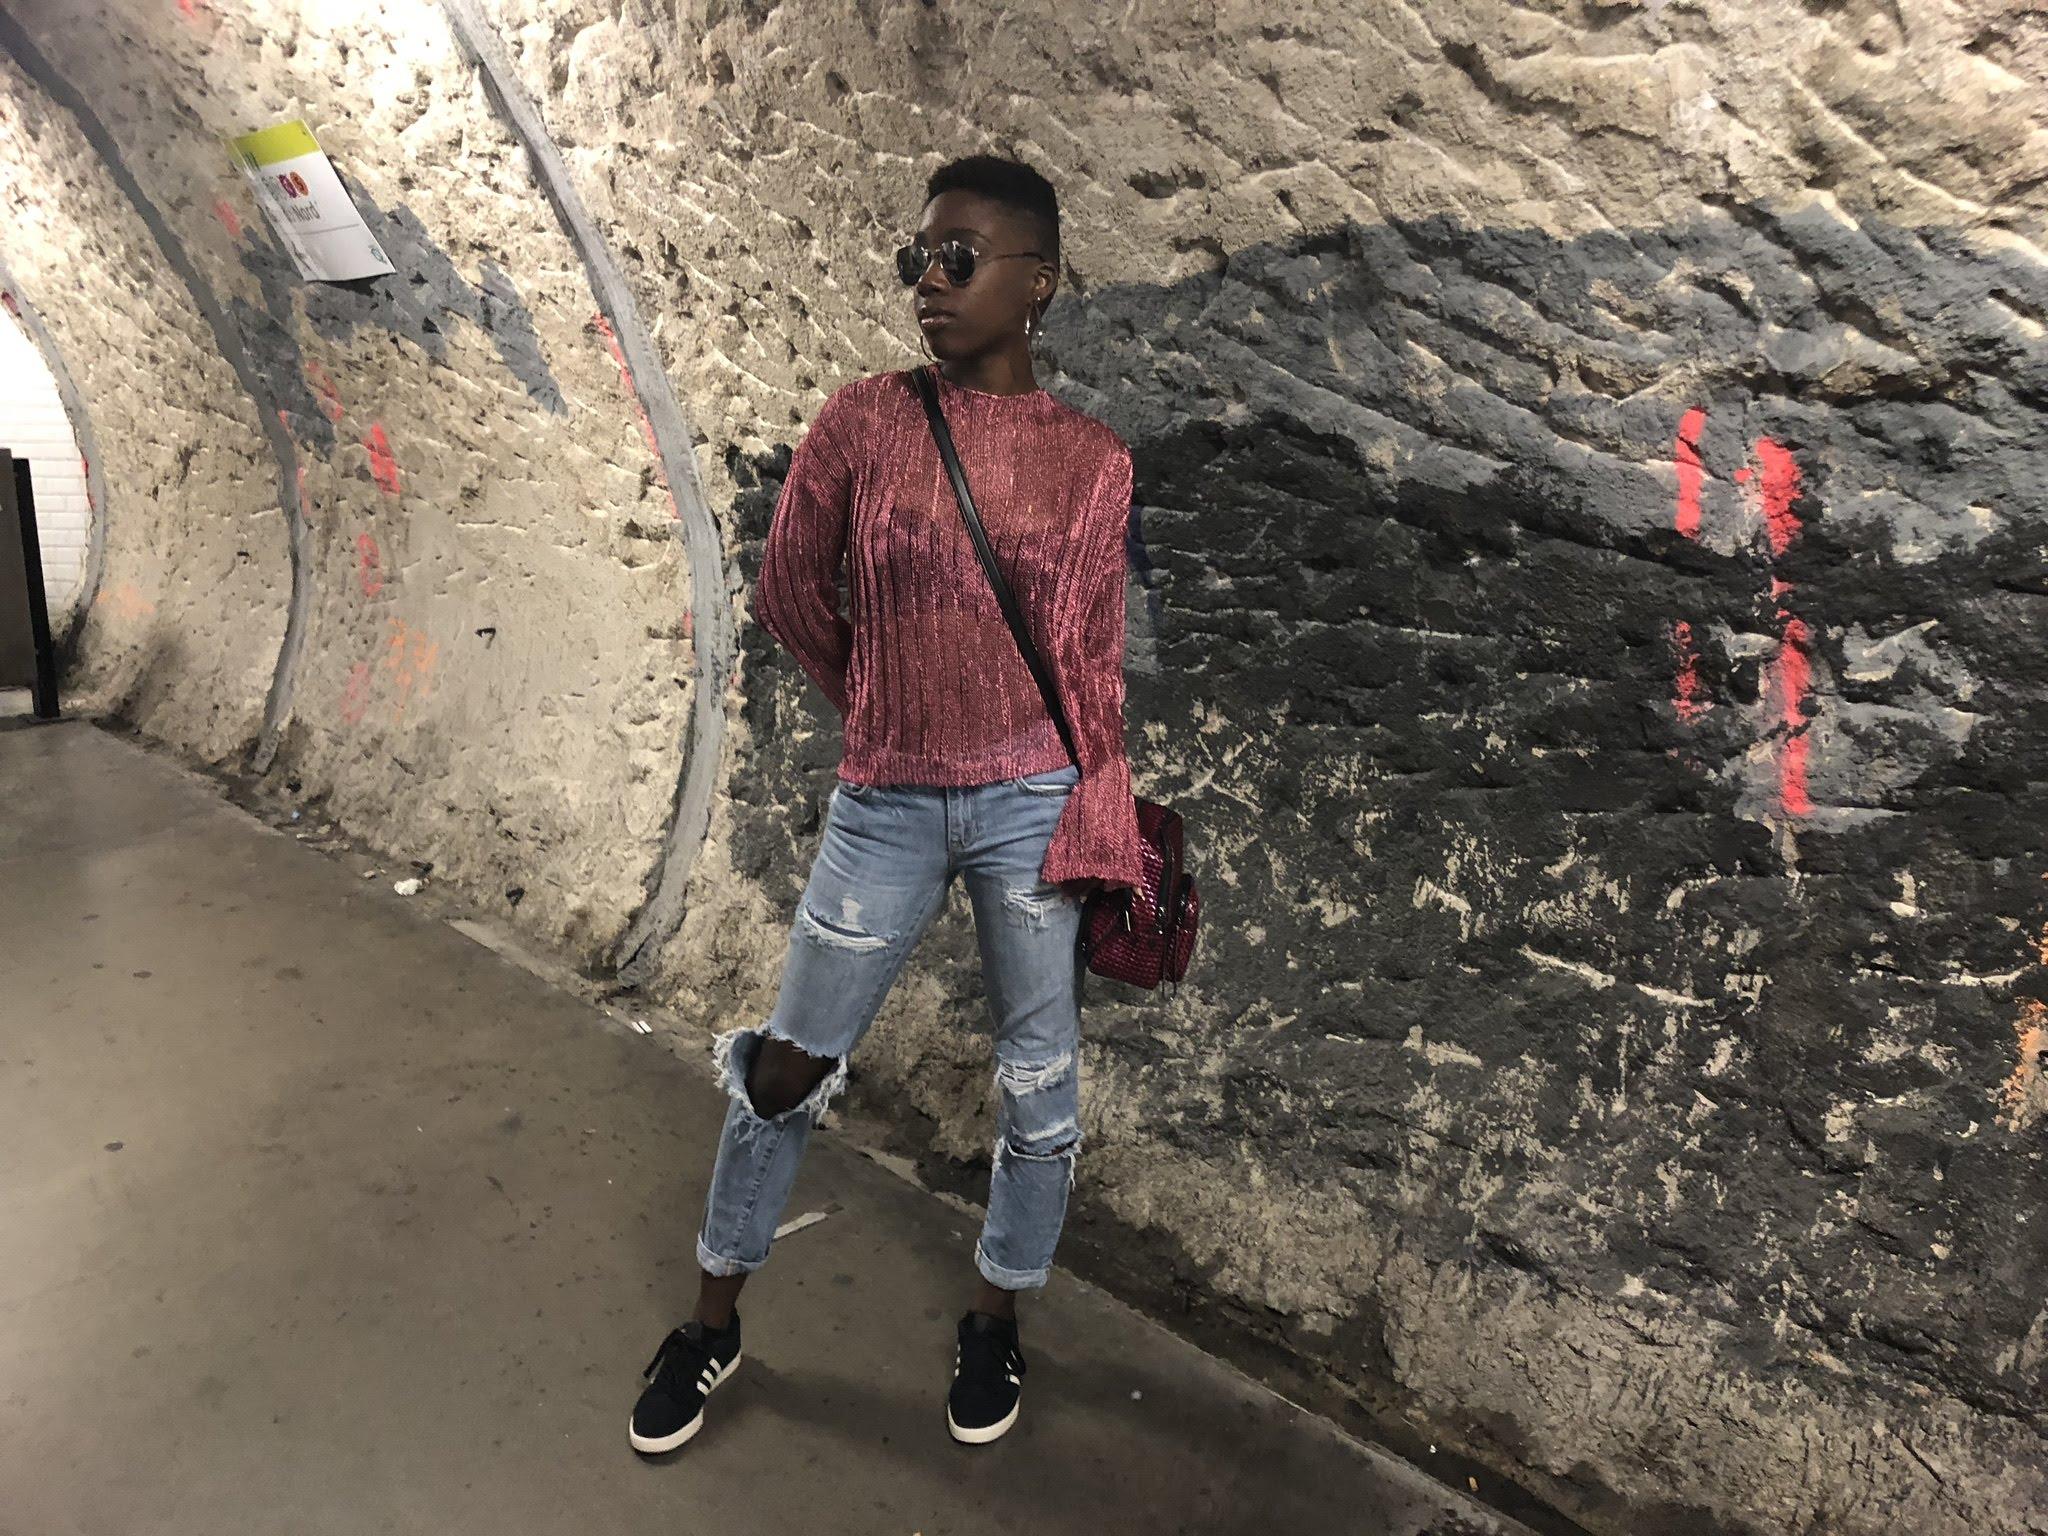 Missguided Top - Gap Boyfriend Jeans,Adidas Neo SneakersJuicy Bag from T.J. Maxx